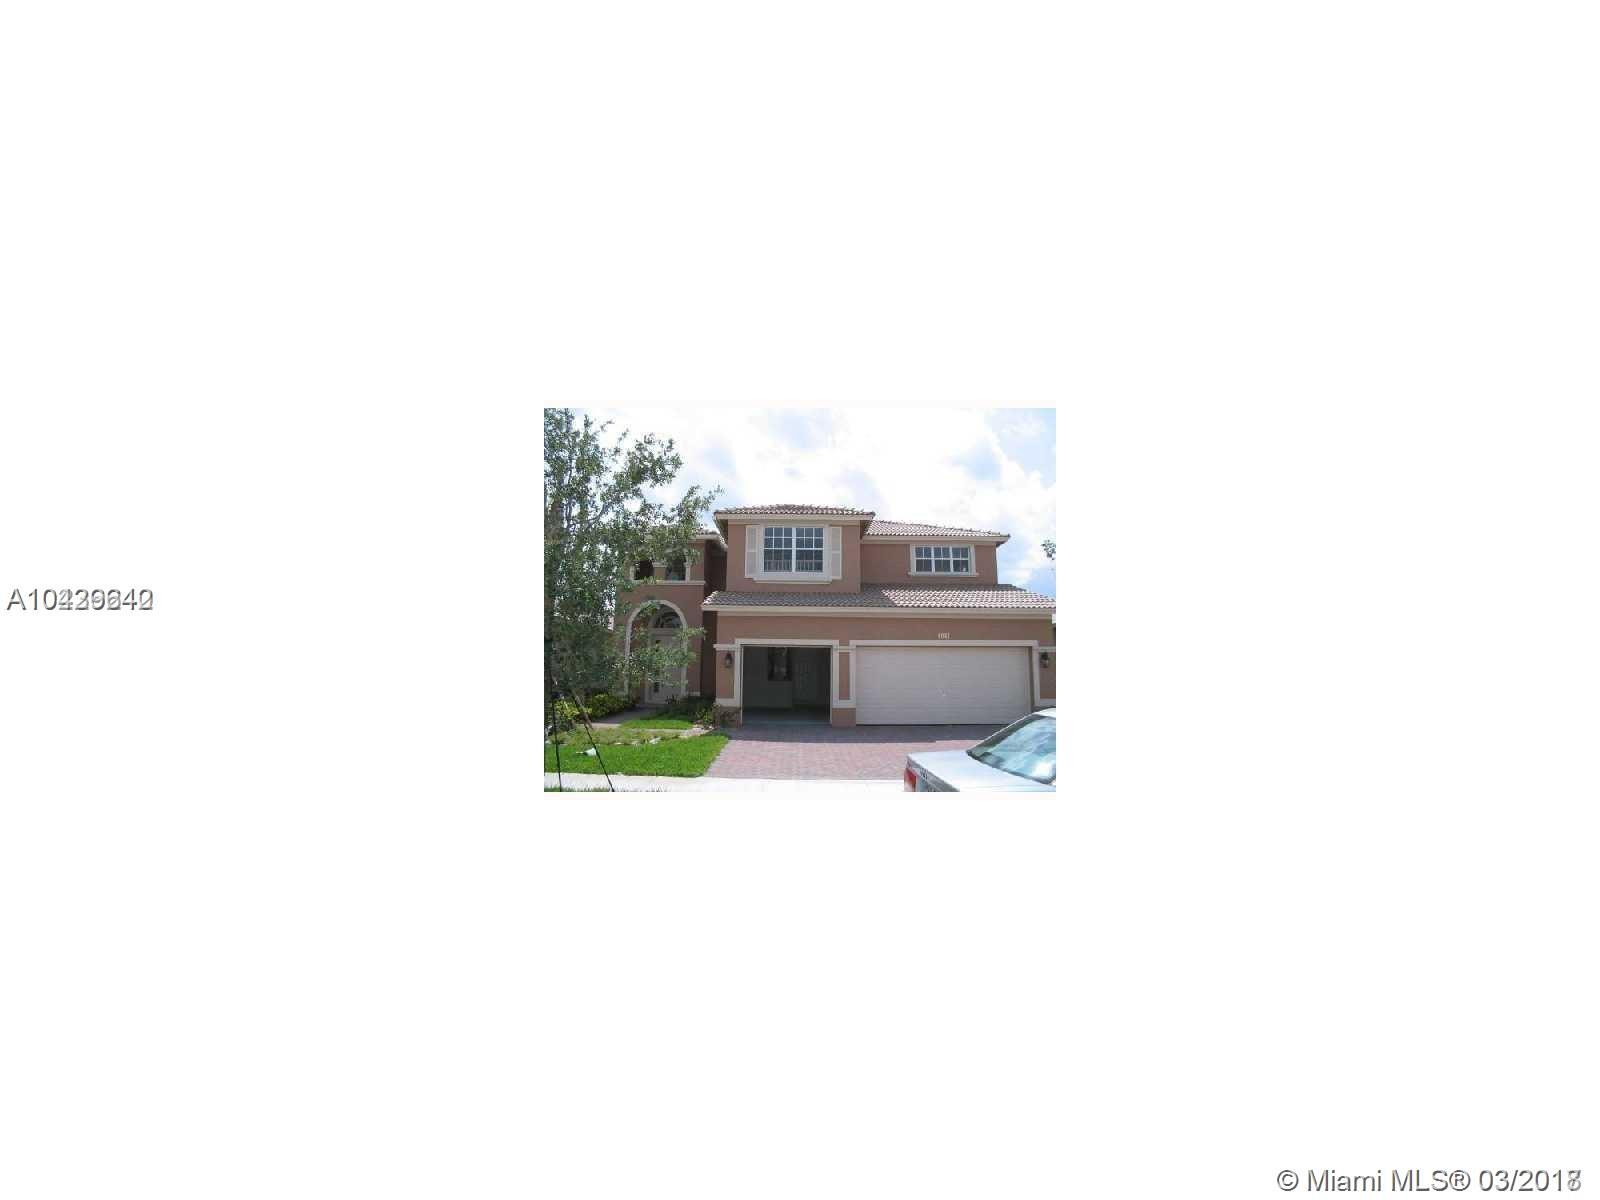 4041 W Whitewater Ave, Weston FL, 33332